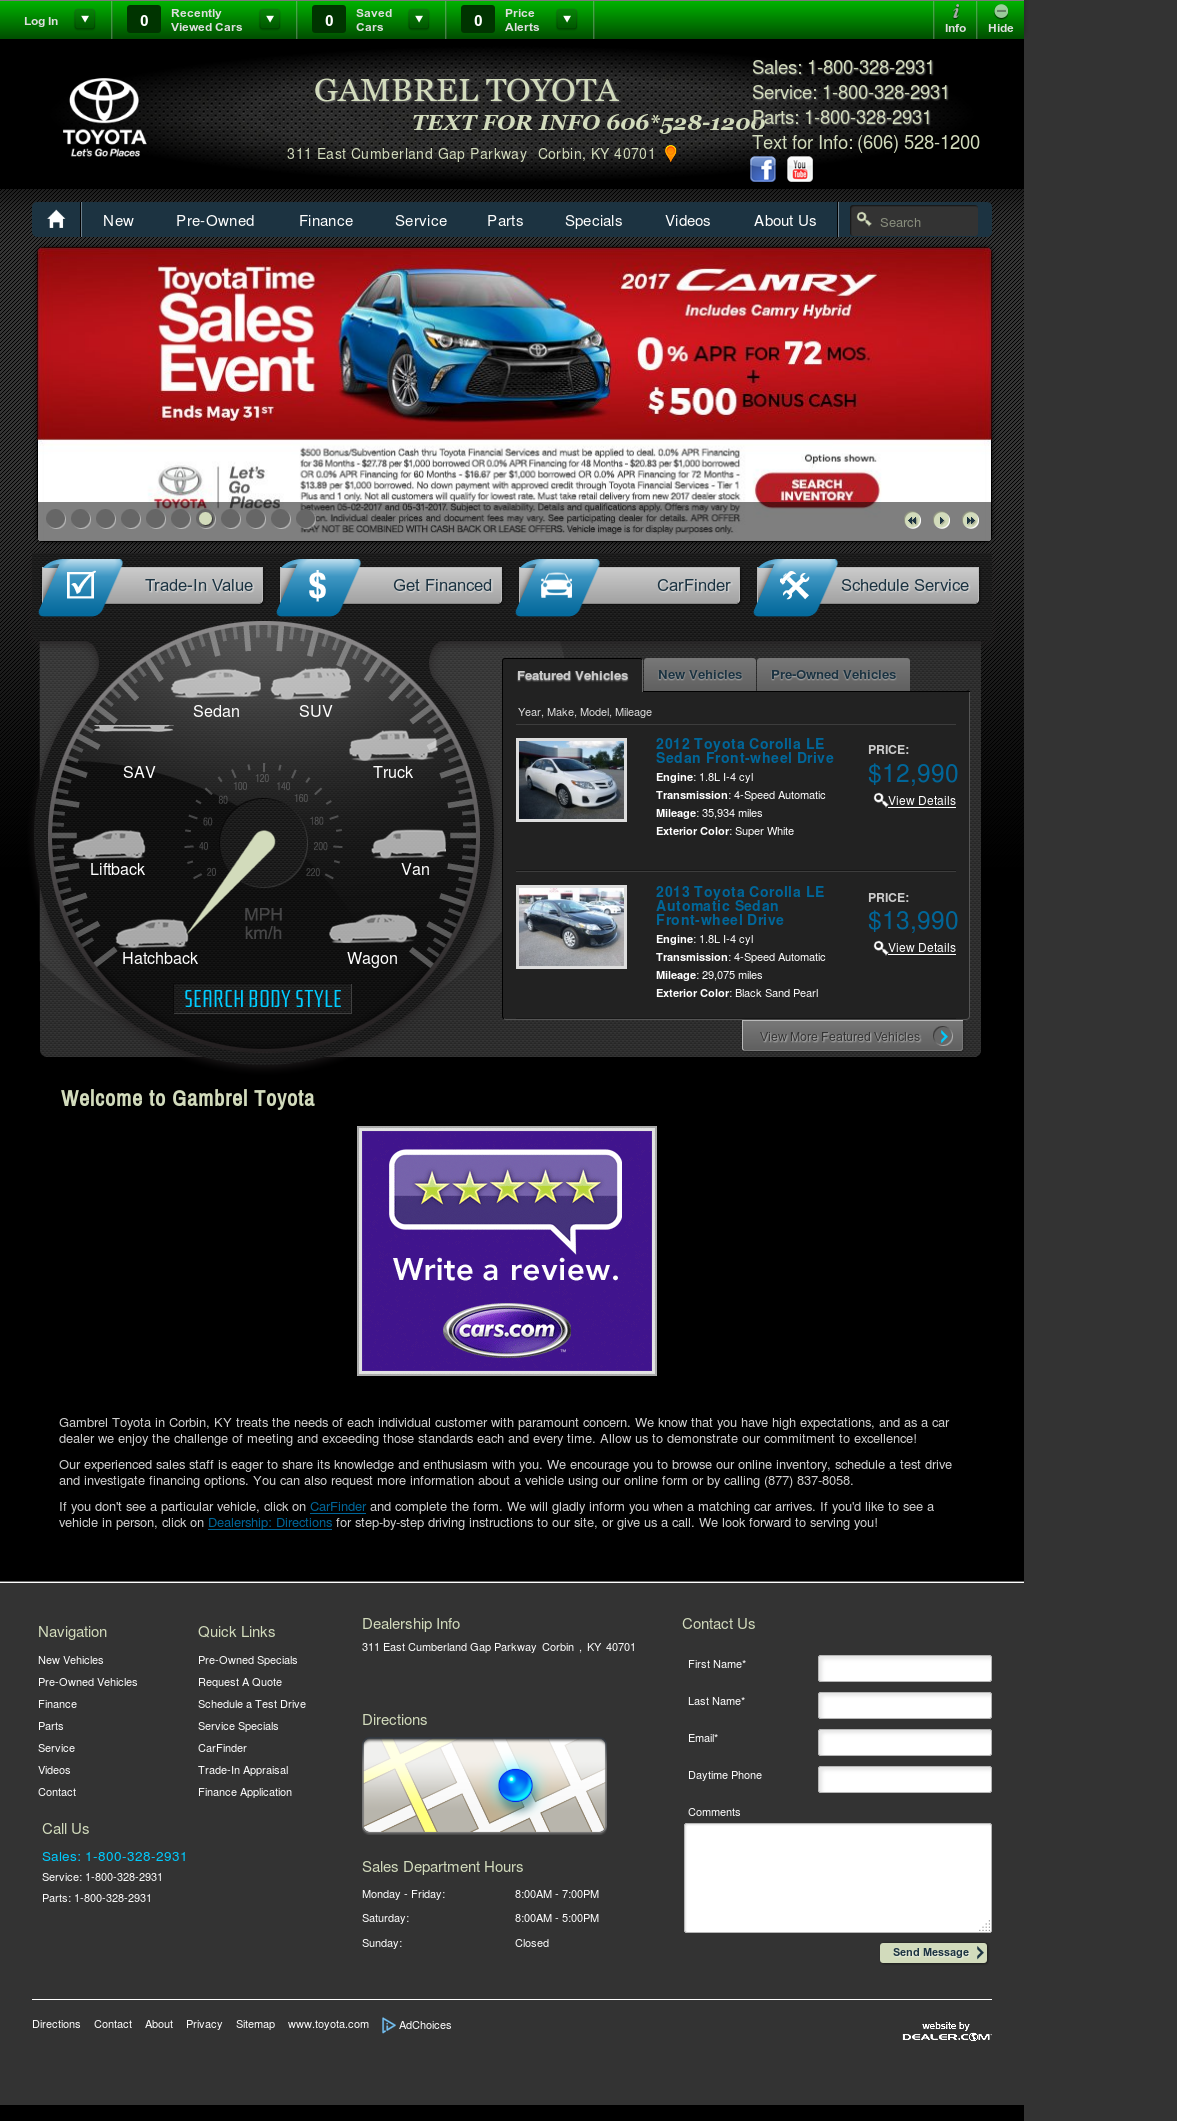 Gambrel Toyotau0027s Website Screenshot On May 2017